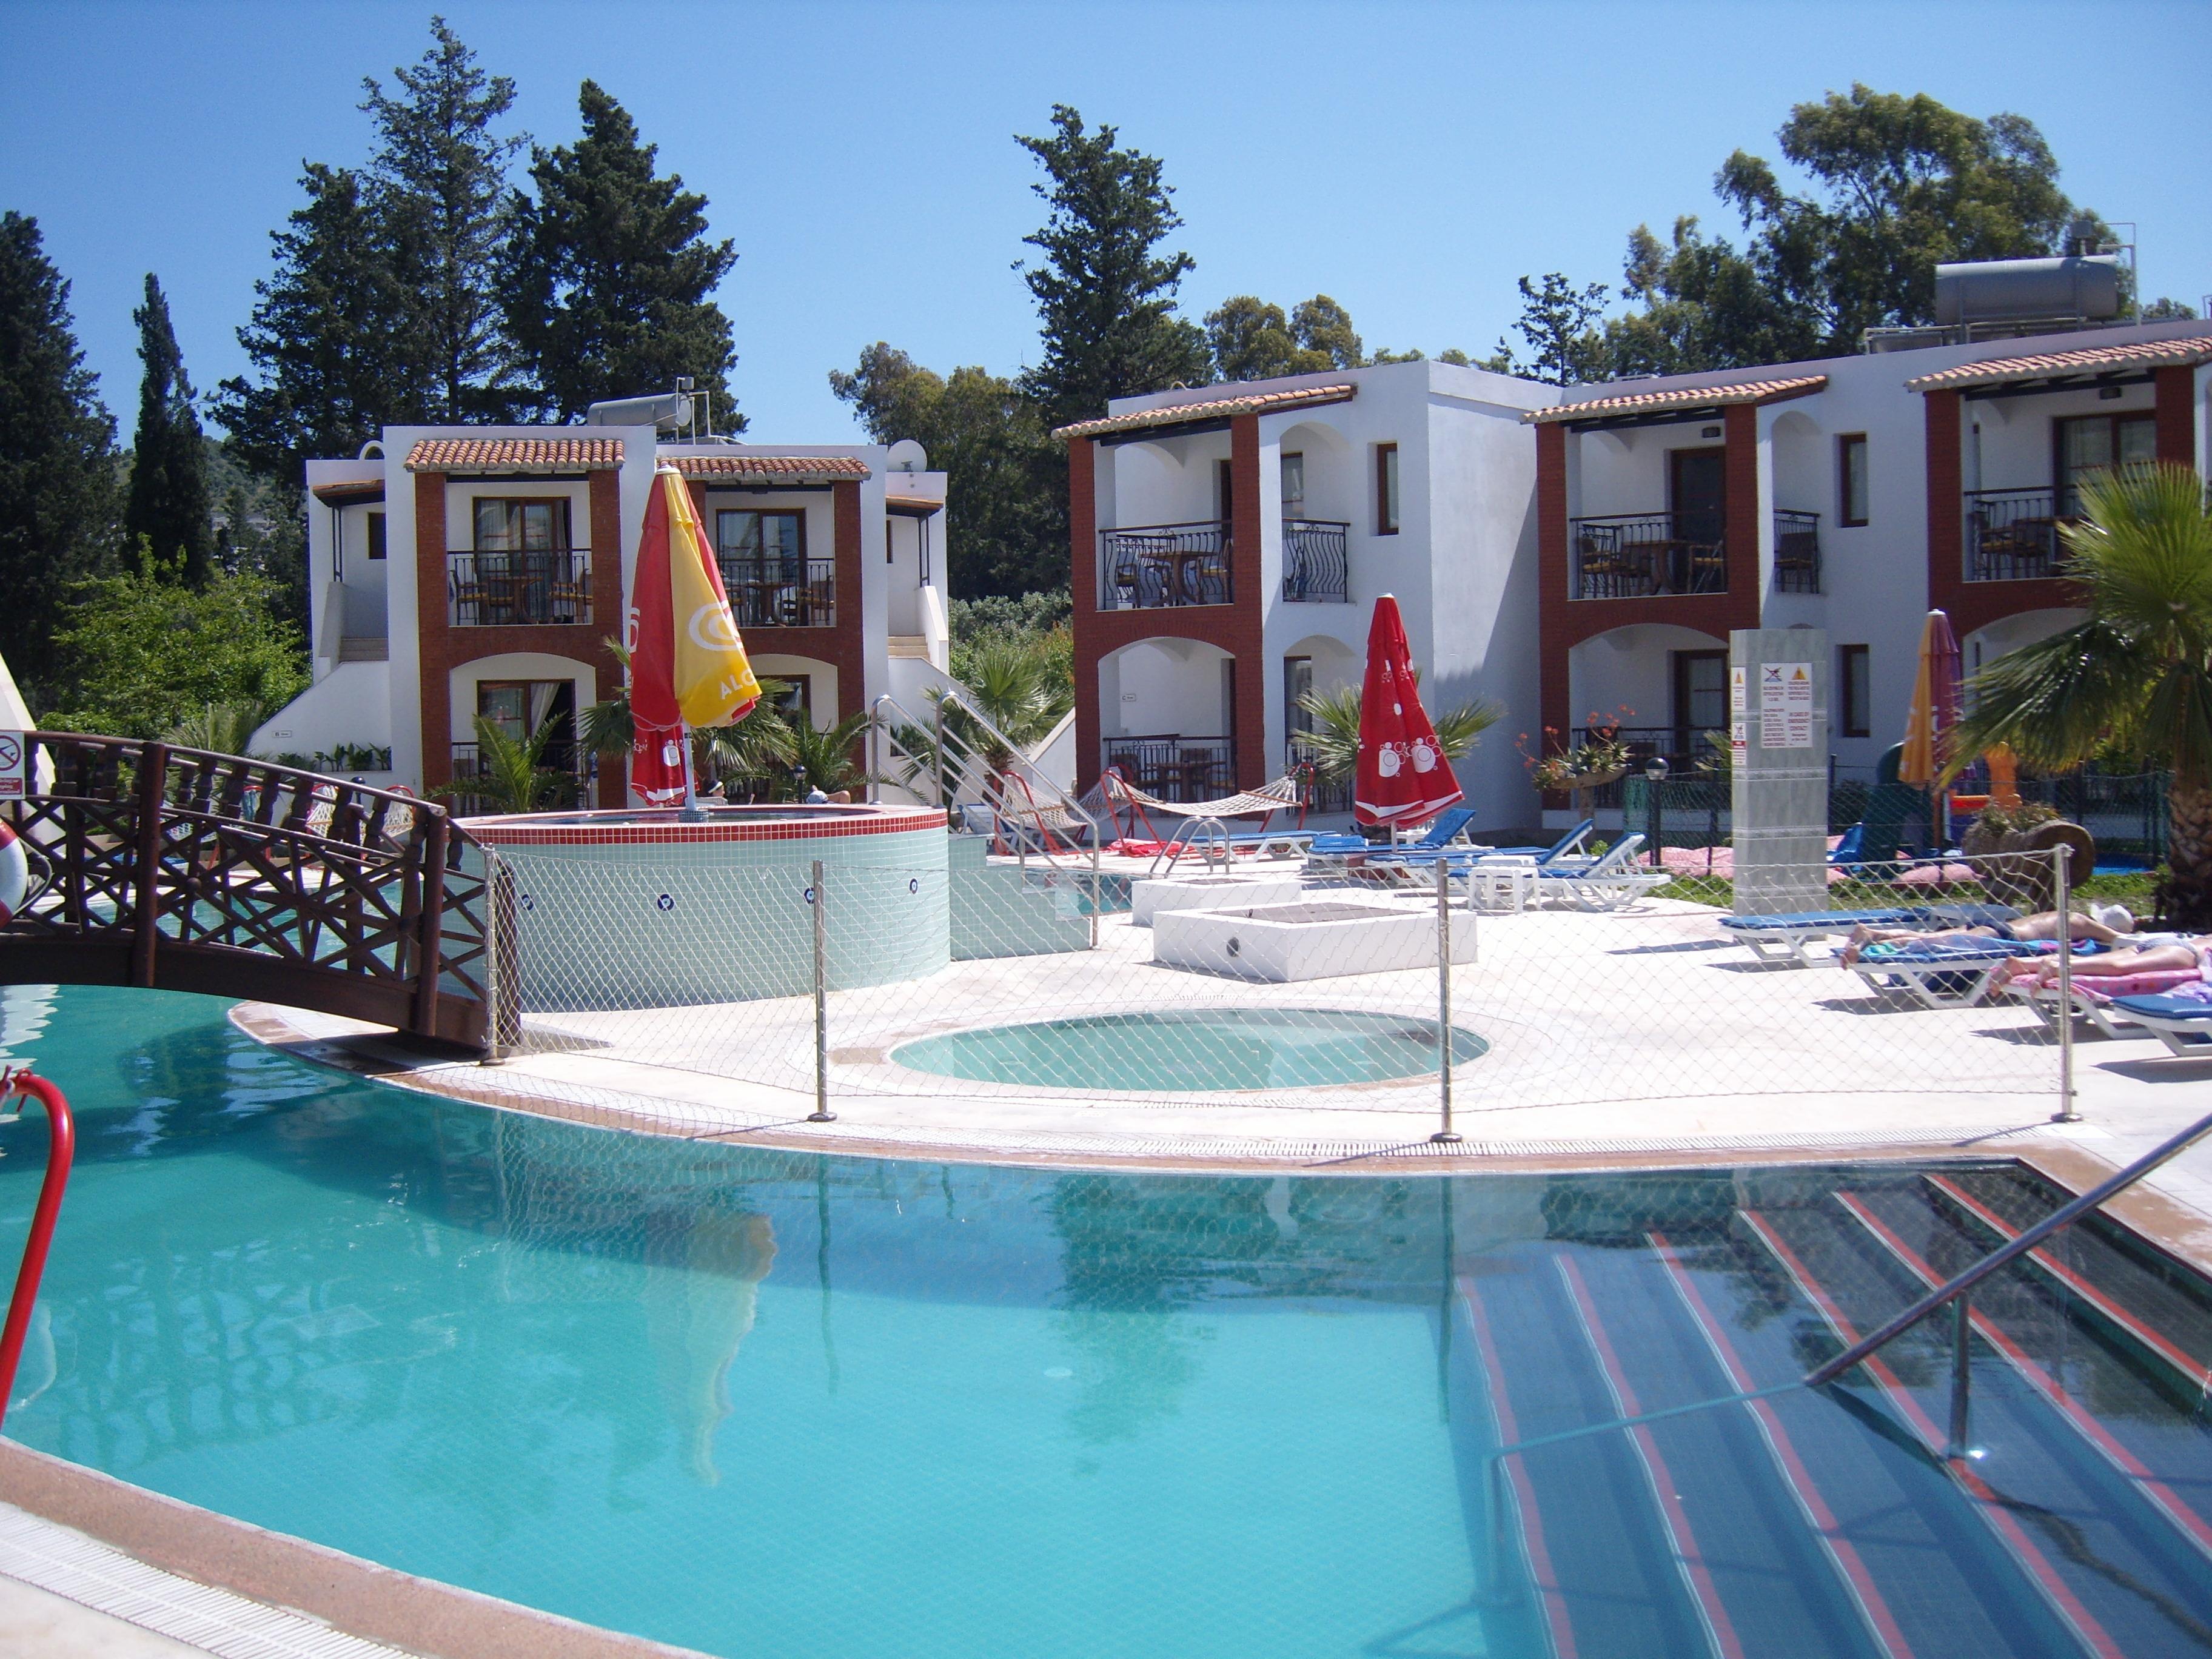 Sirca Apartment Hotel